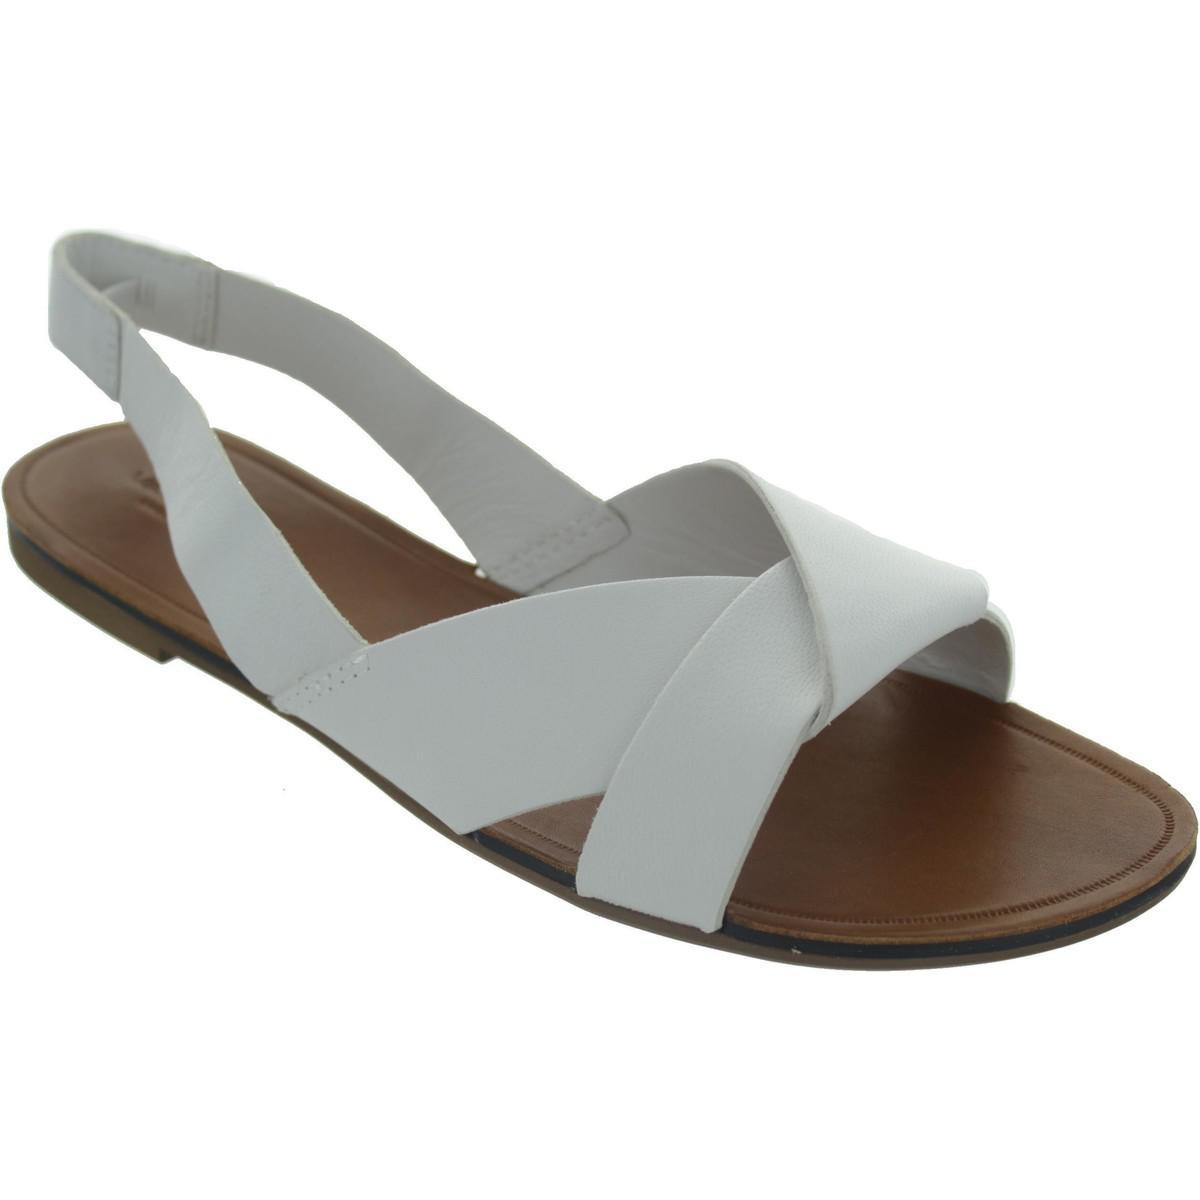 44803ddcc3 Vagabond Women s Tia White Sandals In Lyst uOkZiTPX